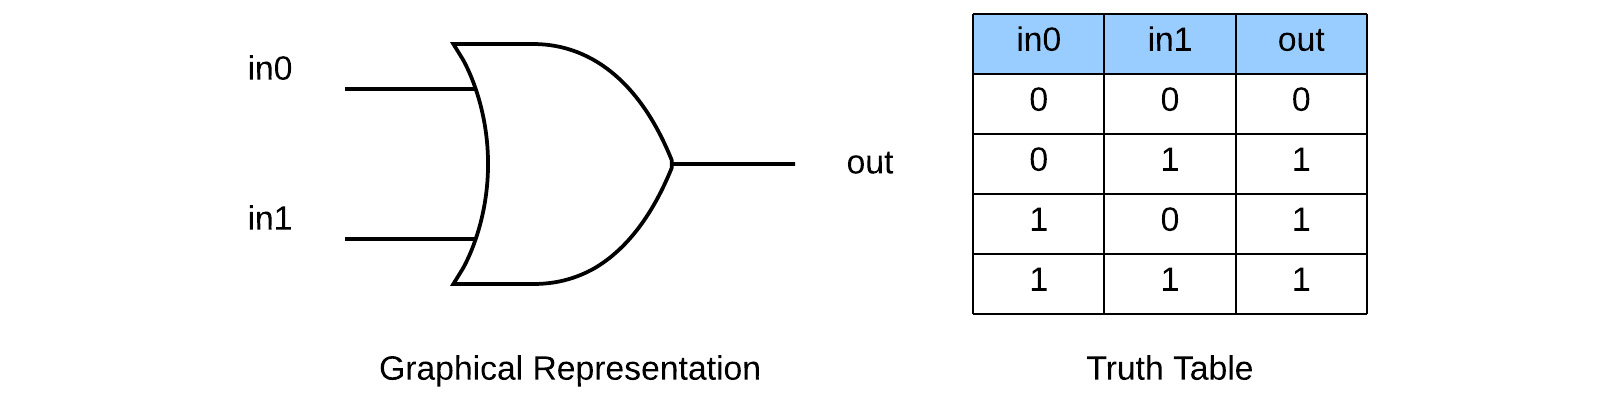 Figure 1.4 – OR gate representation